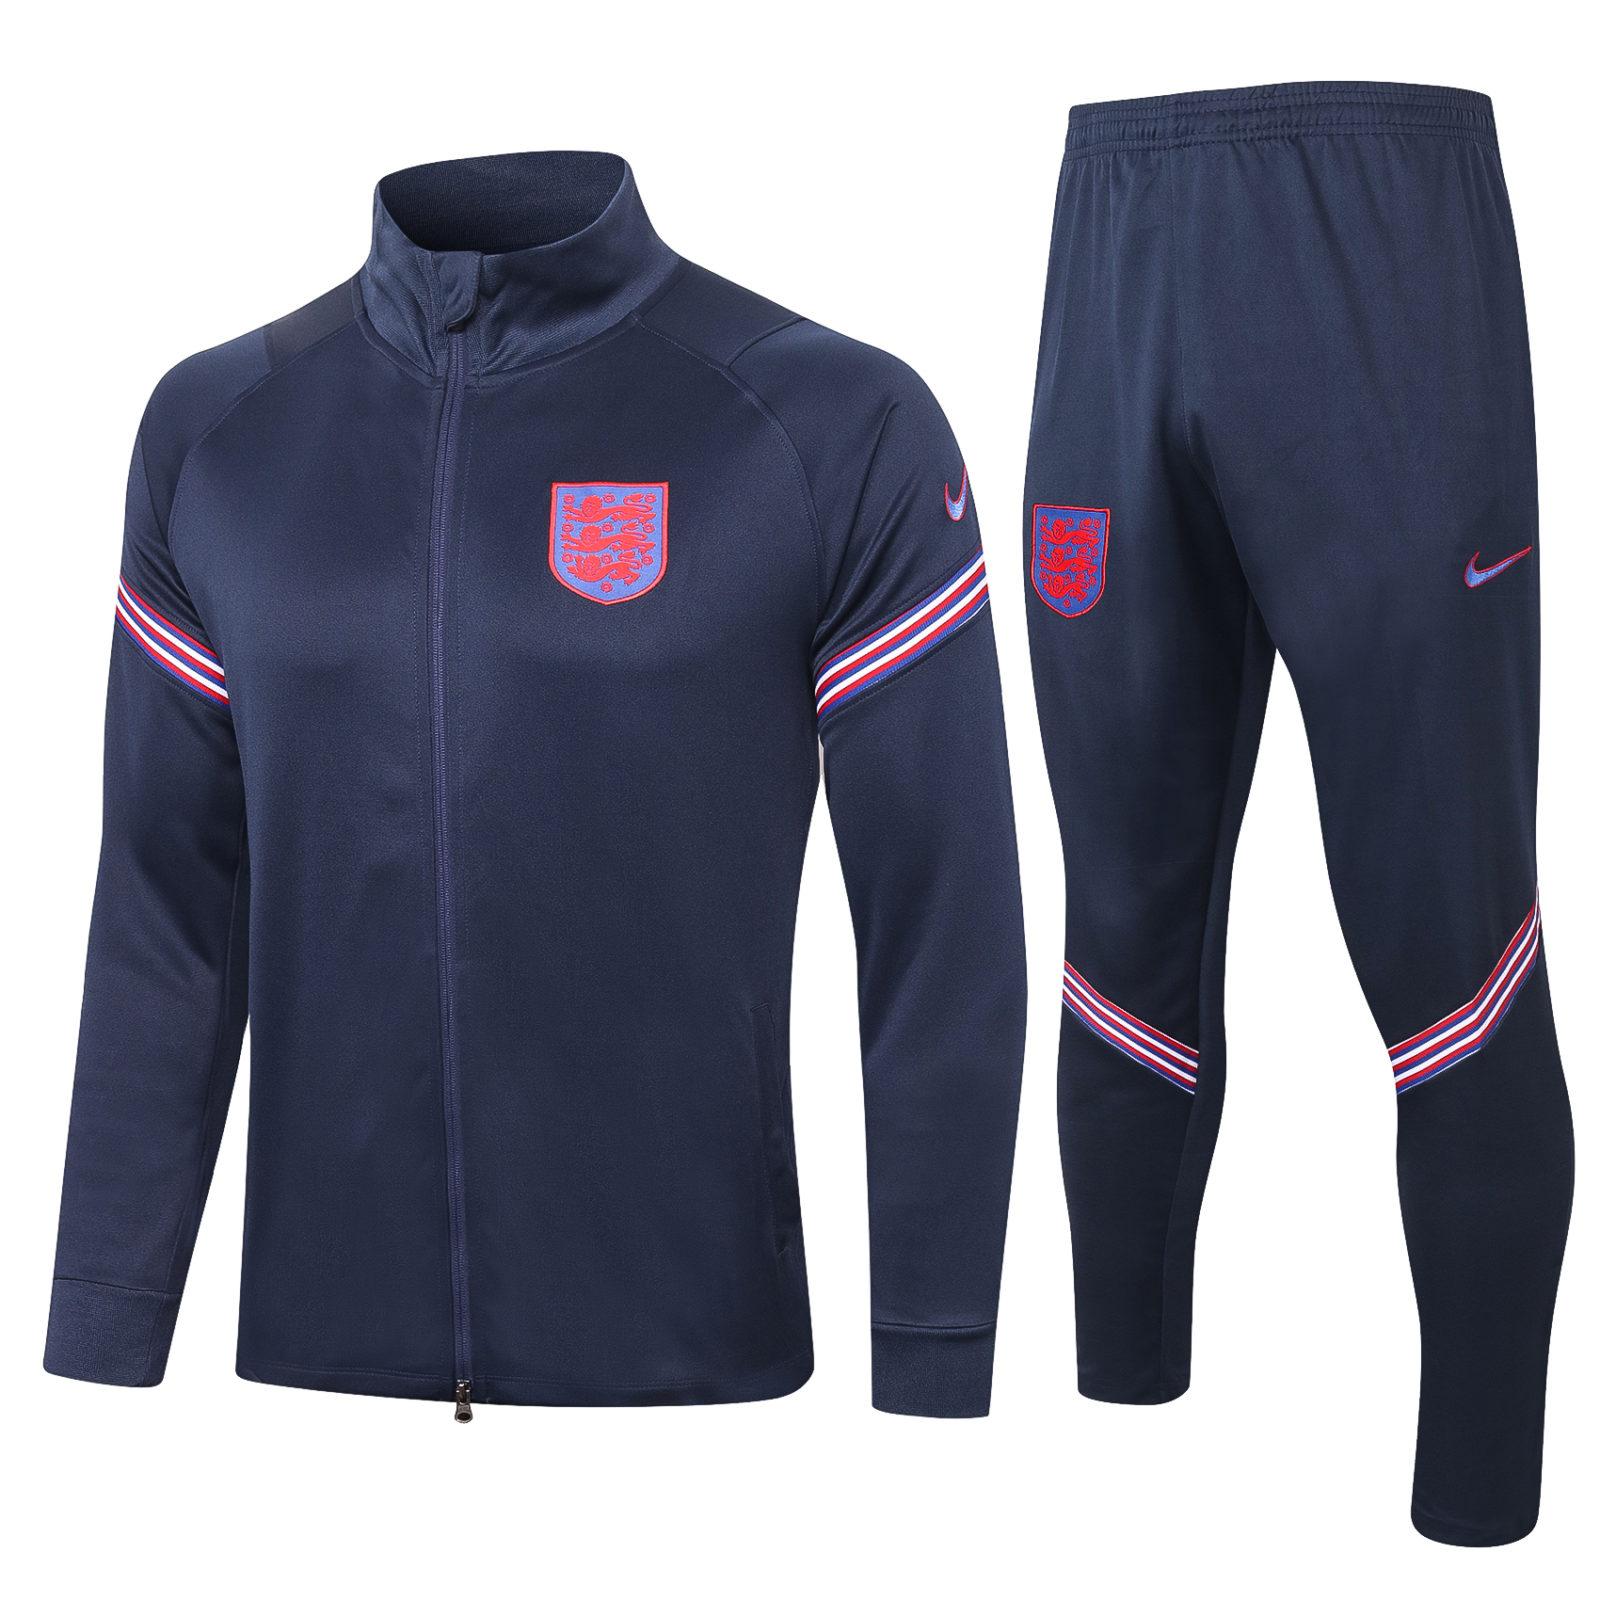 Спортивный костюм сборной Англии Евро 2020 арт. 81000